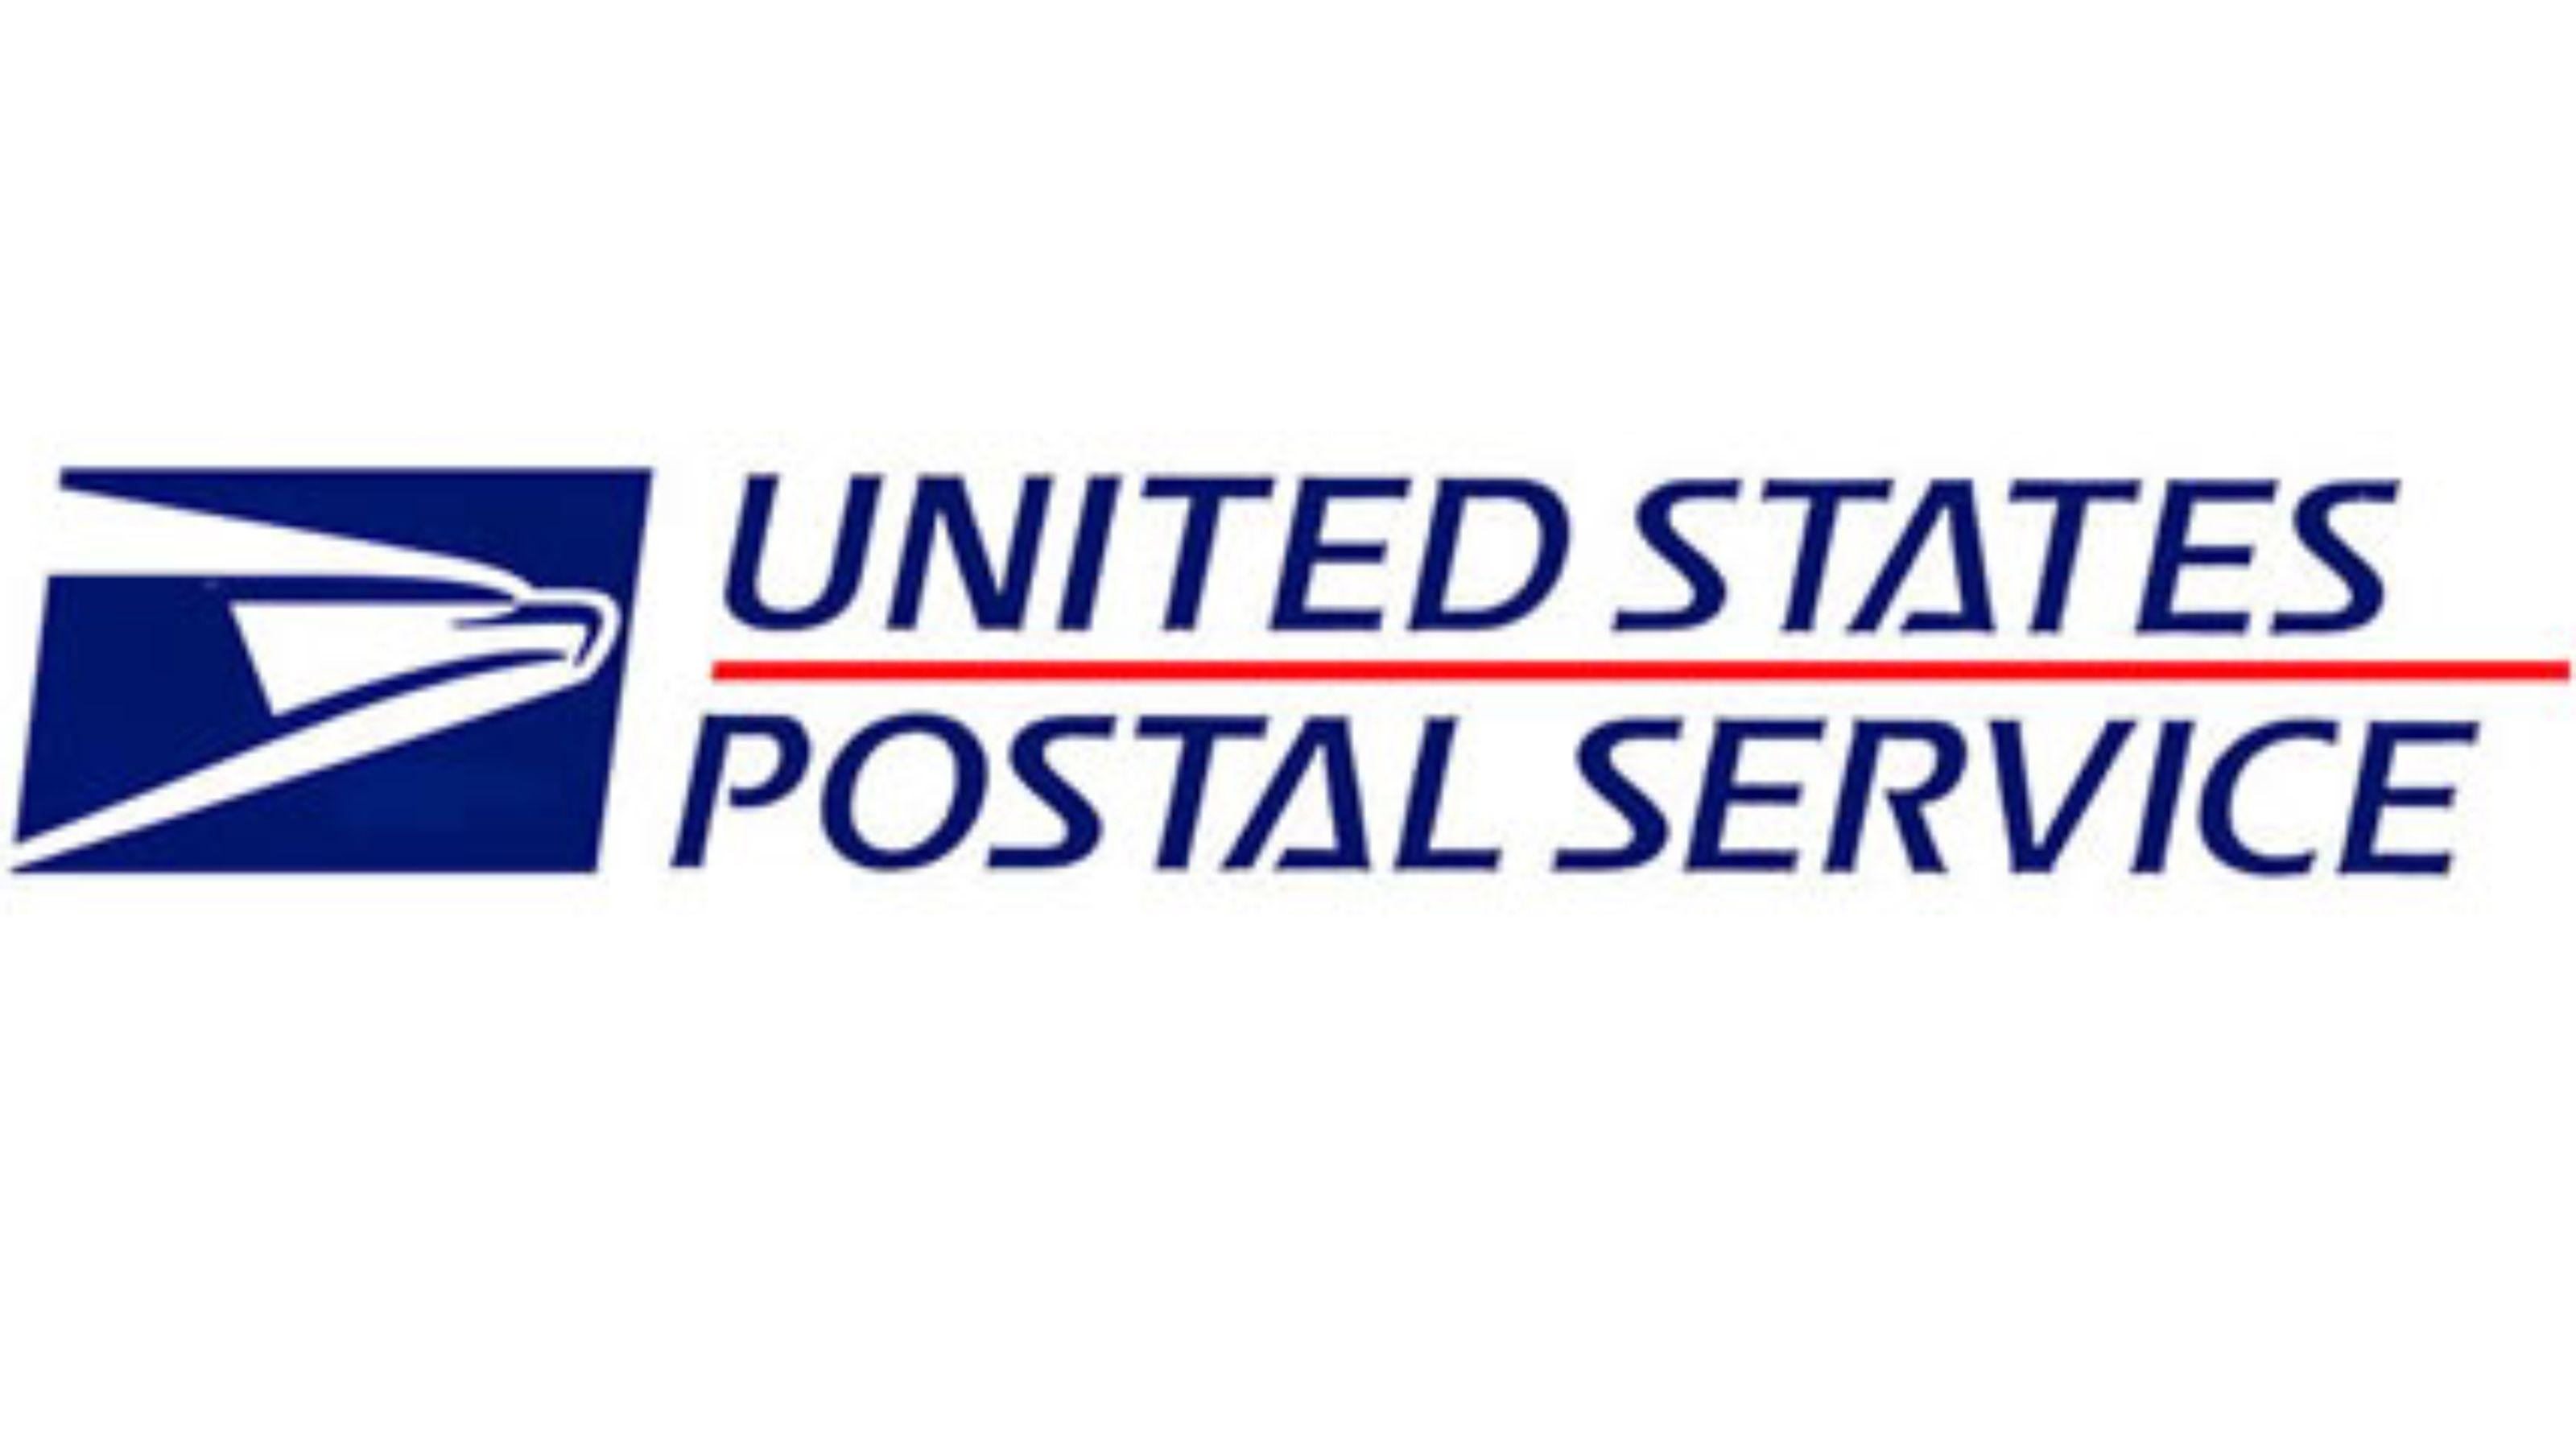 usps_logo_postal_service